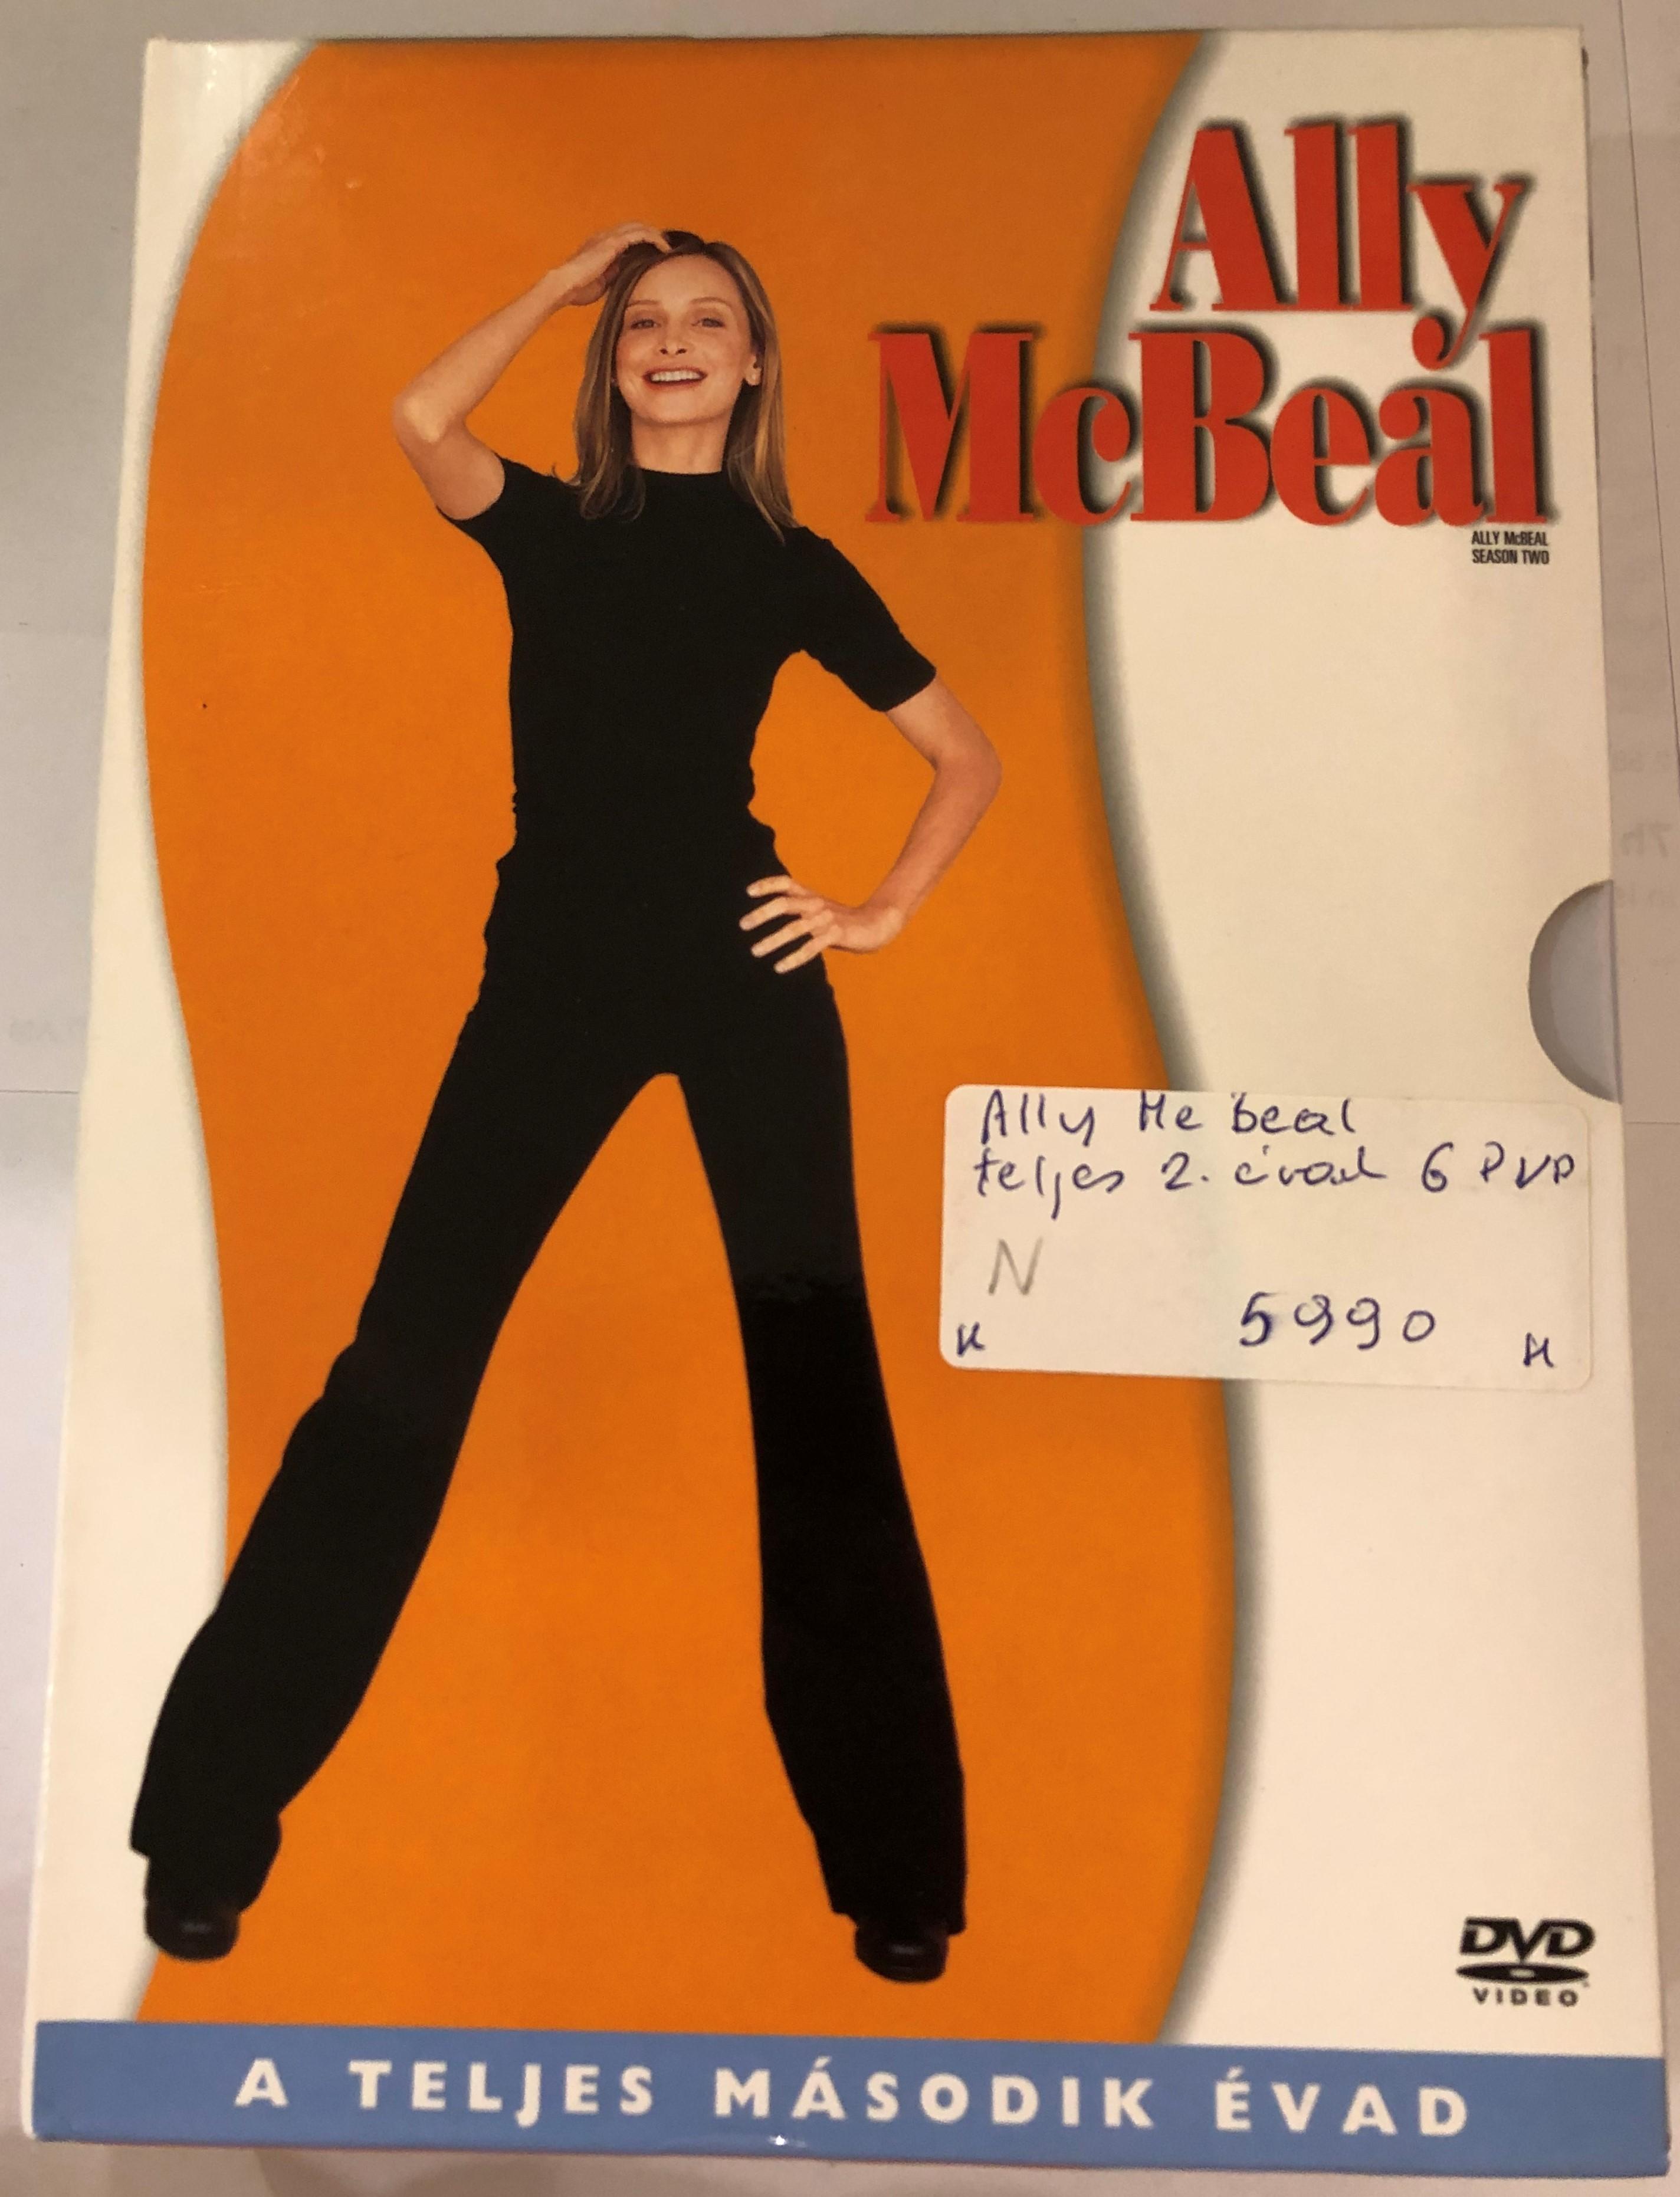 ally-mcbeal-season-two-dvd-ally-mcbeal-a-teljes-m-sodik-vad-created-by-david-e.-kelley-1-.jpg